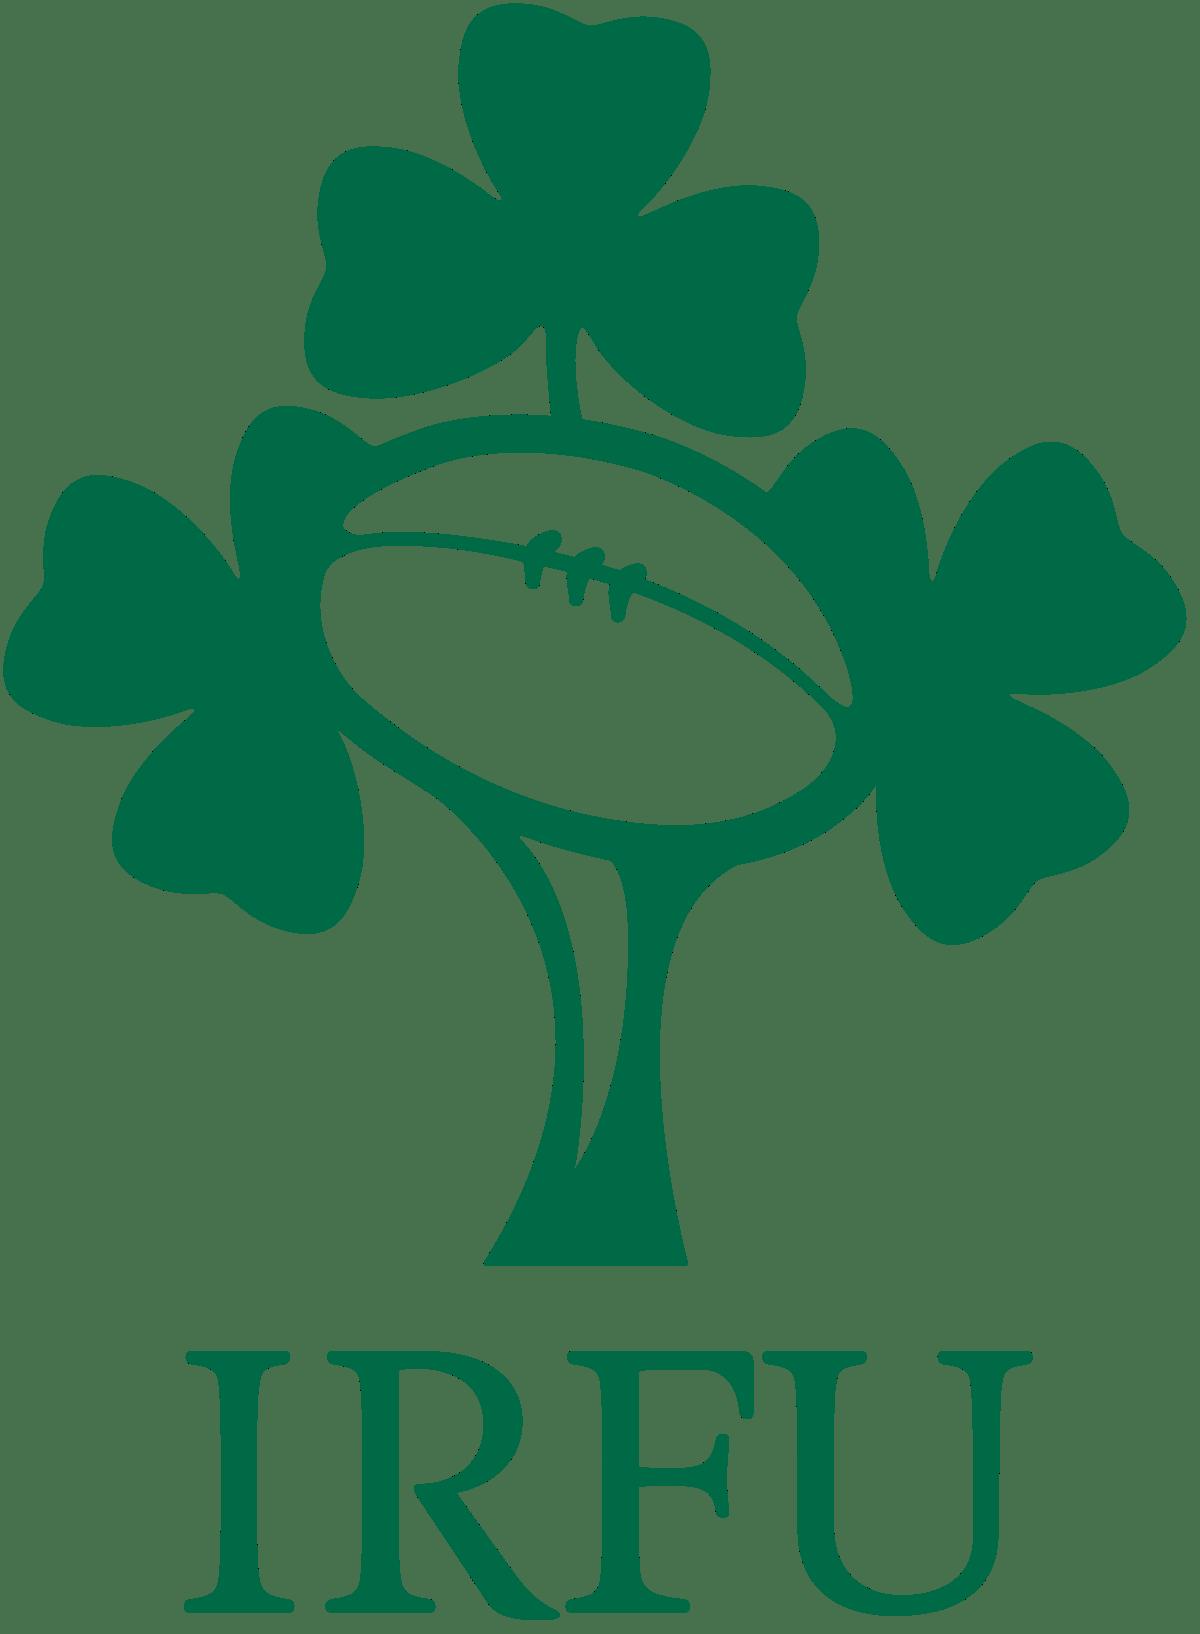 Irish Rugby Football Union Logo Transparent Png Stickpng